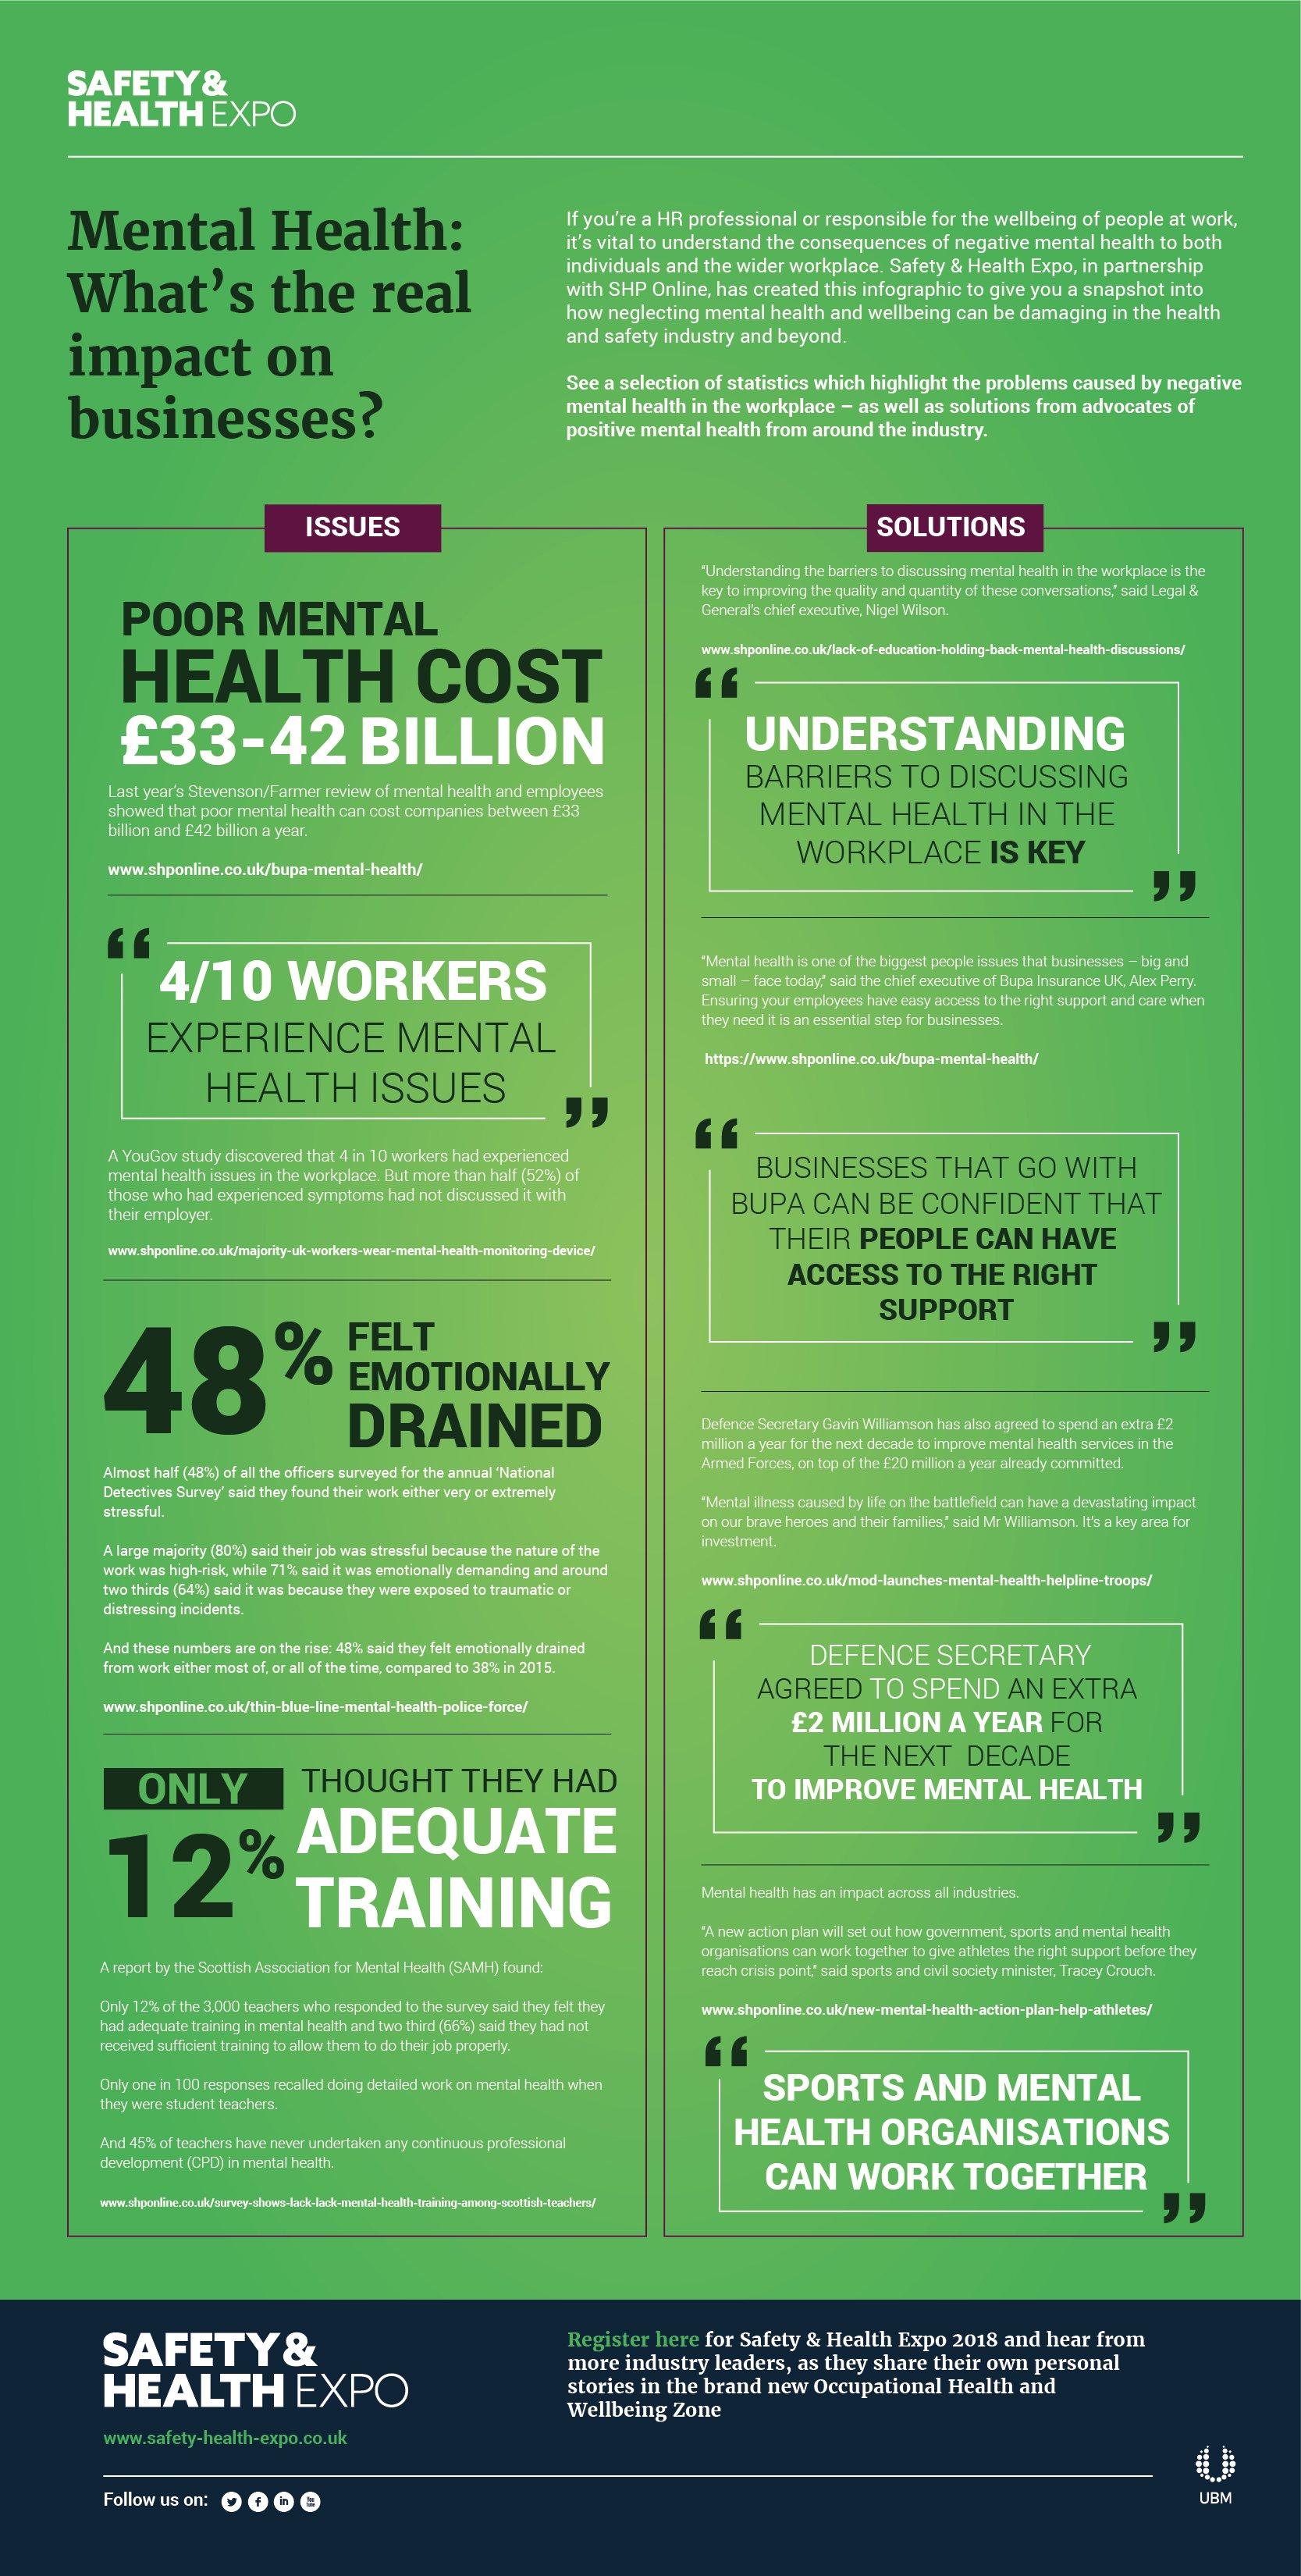 Mental health, HR, Wellbeing